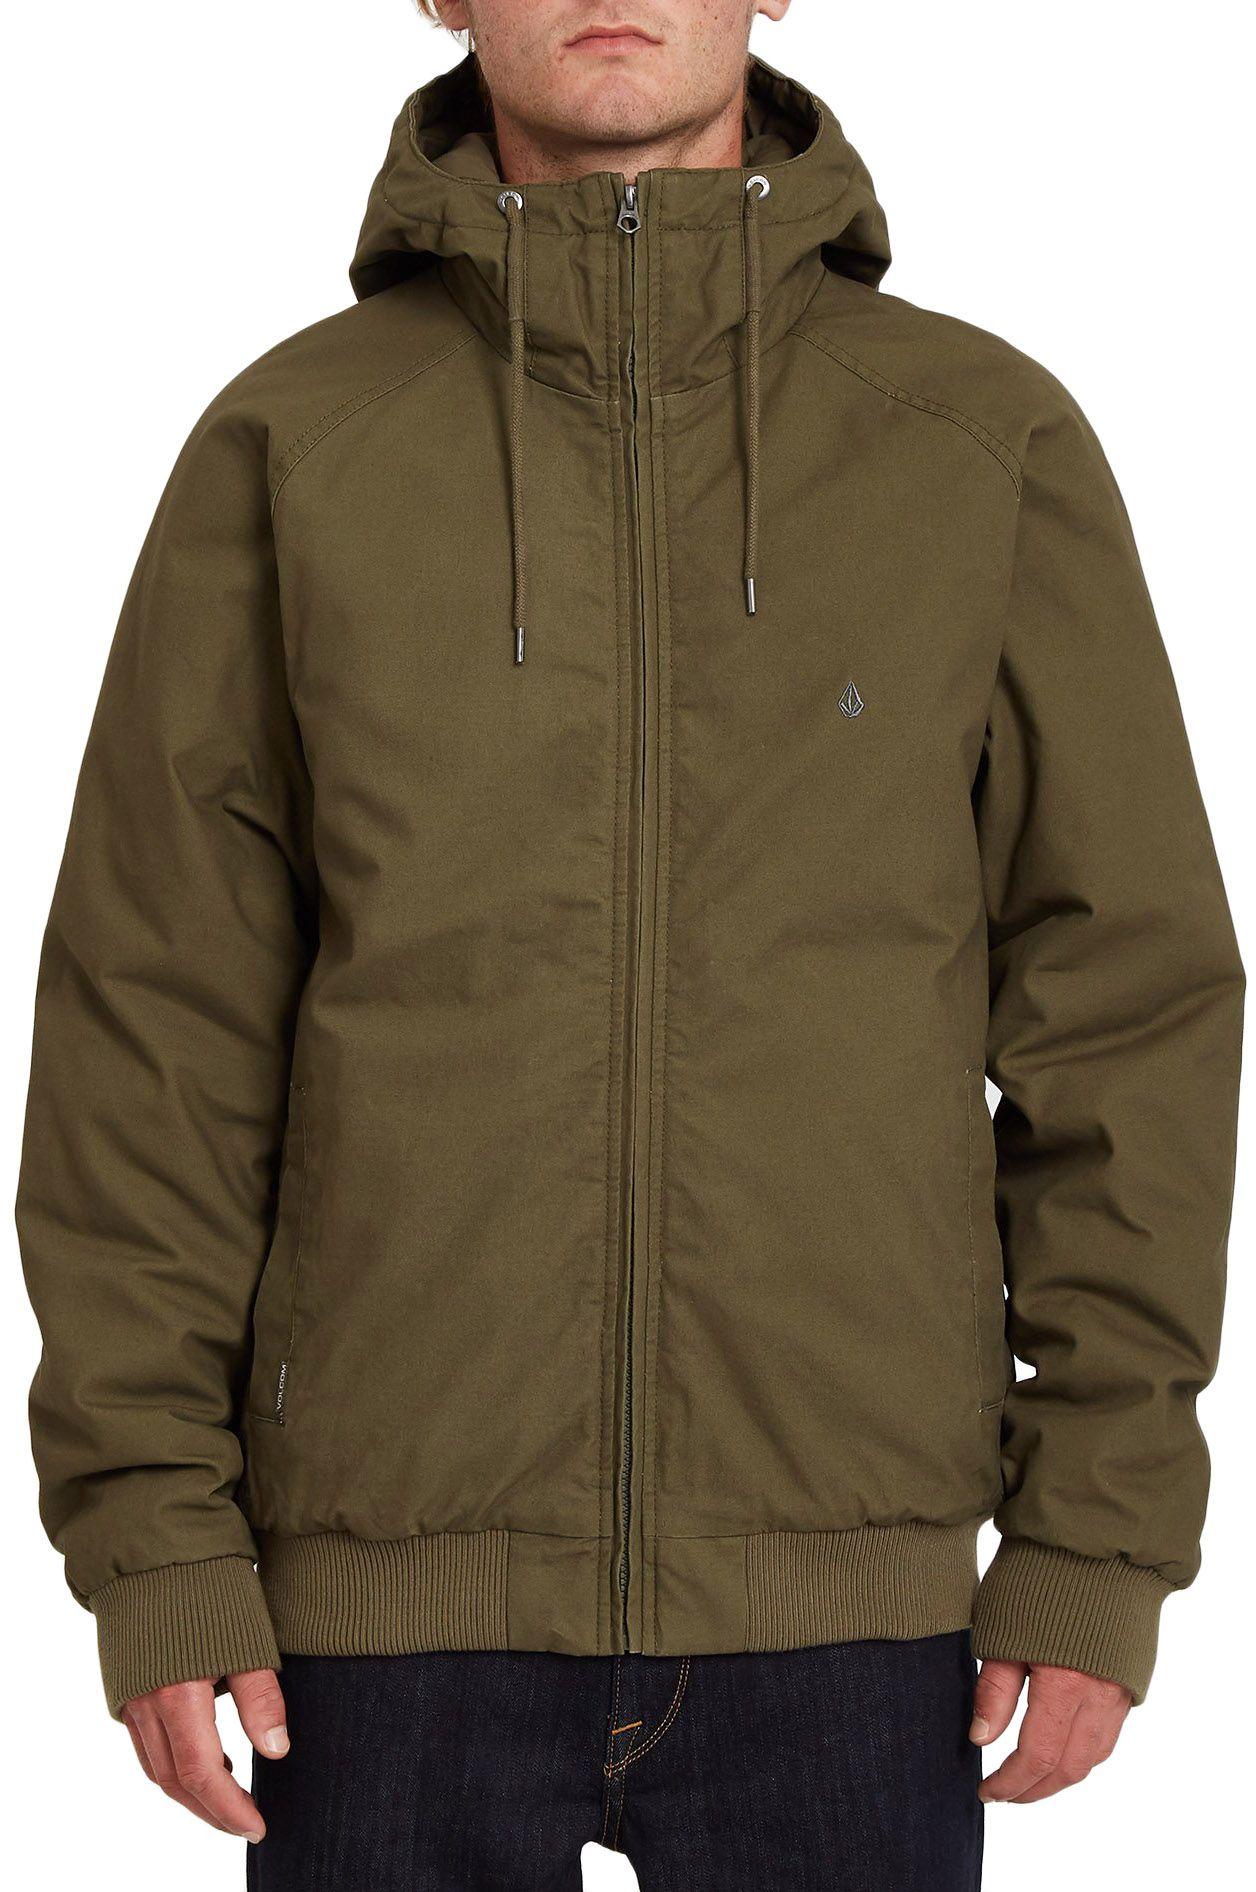 Volcom Jacket HERNAN COASTER JKT Military